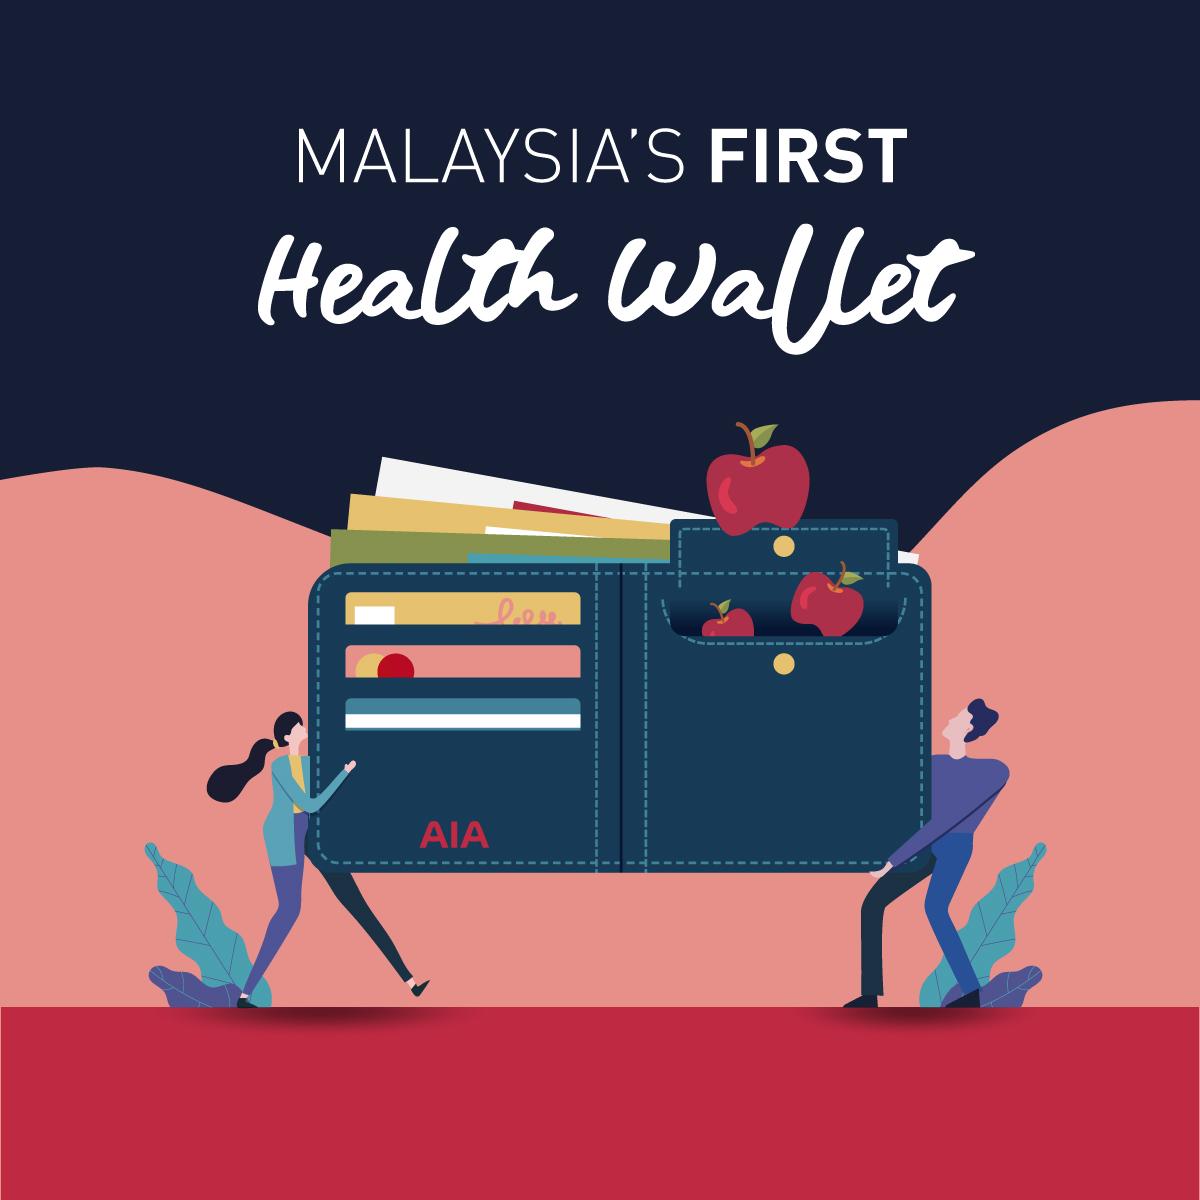 AIA_Health wallet carousell_R1-01_opt2.jpg